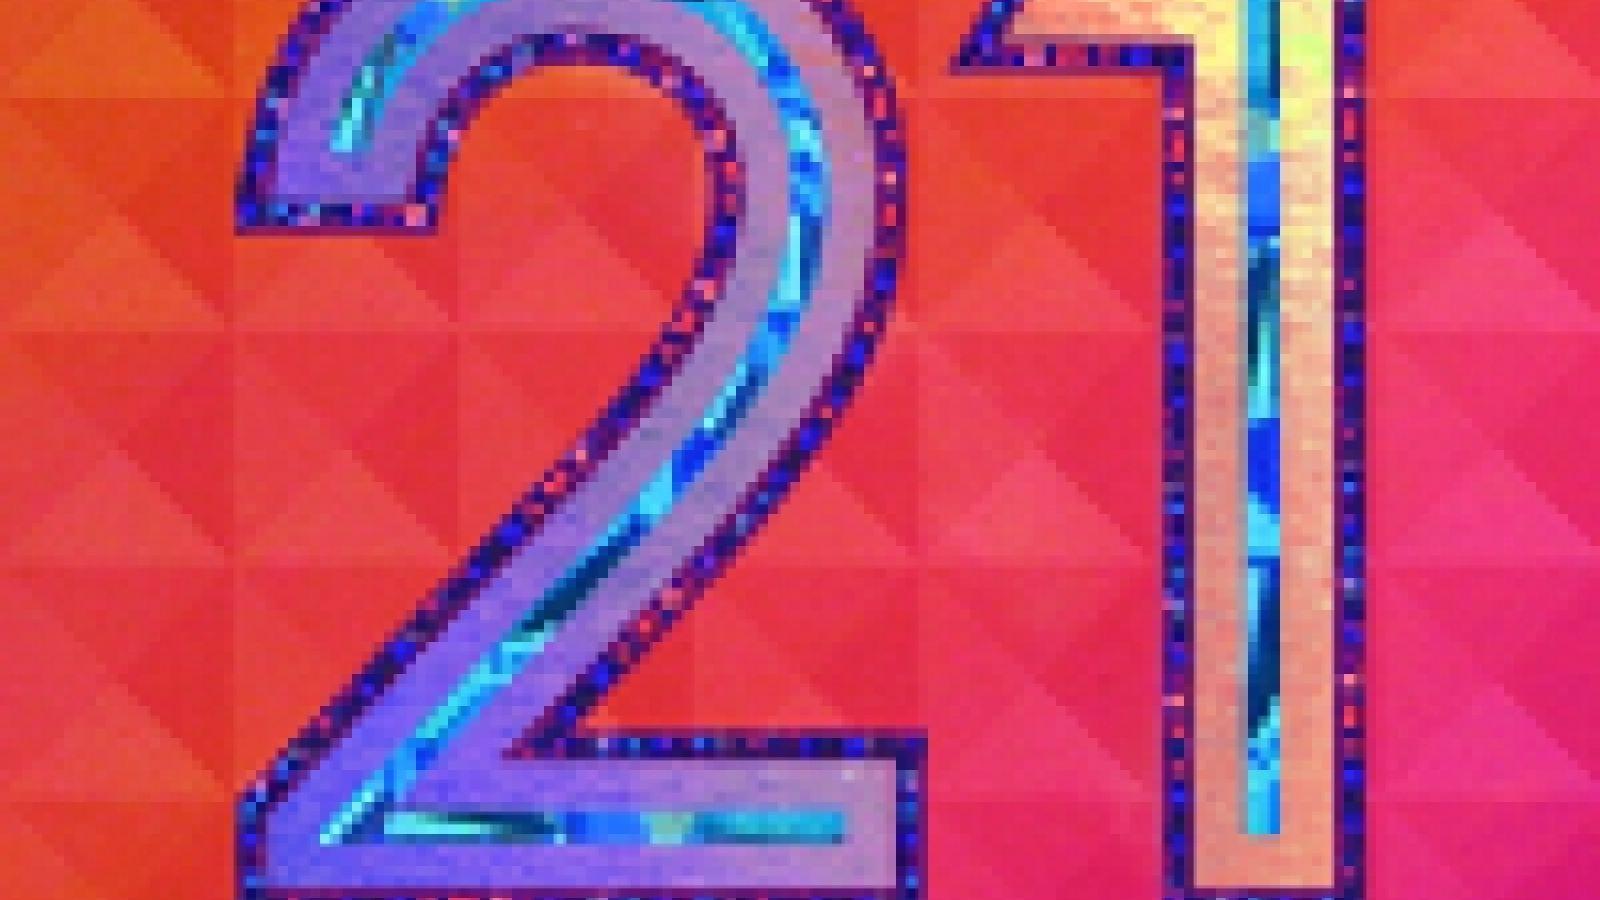 2NE1 - To Anyone © Tinsel-Pr